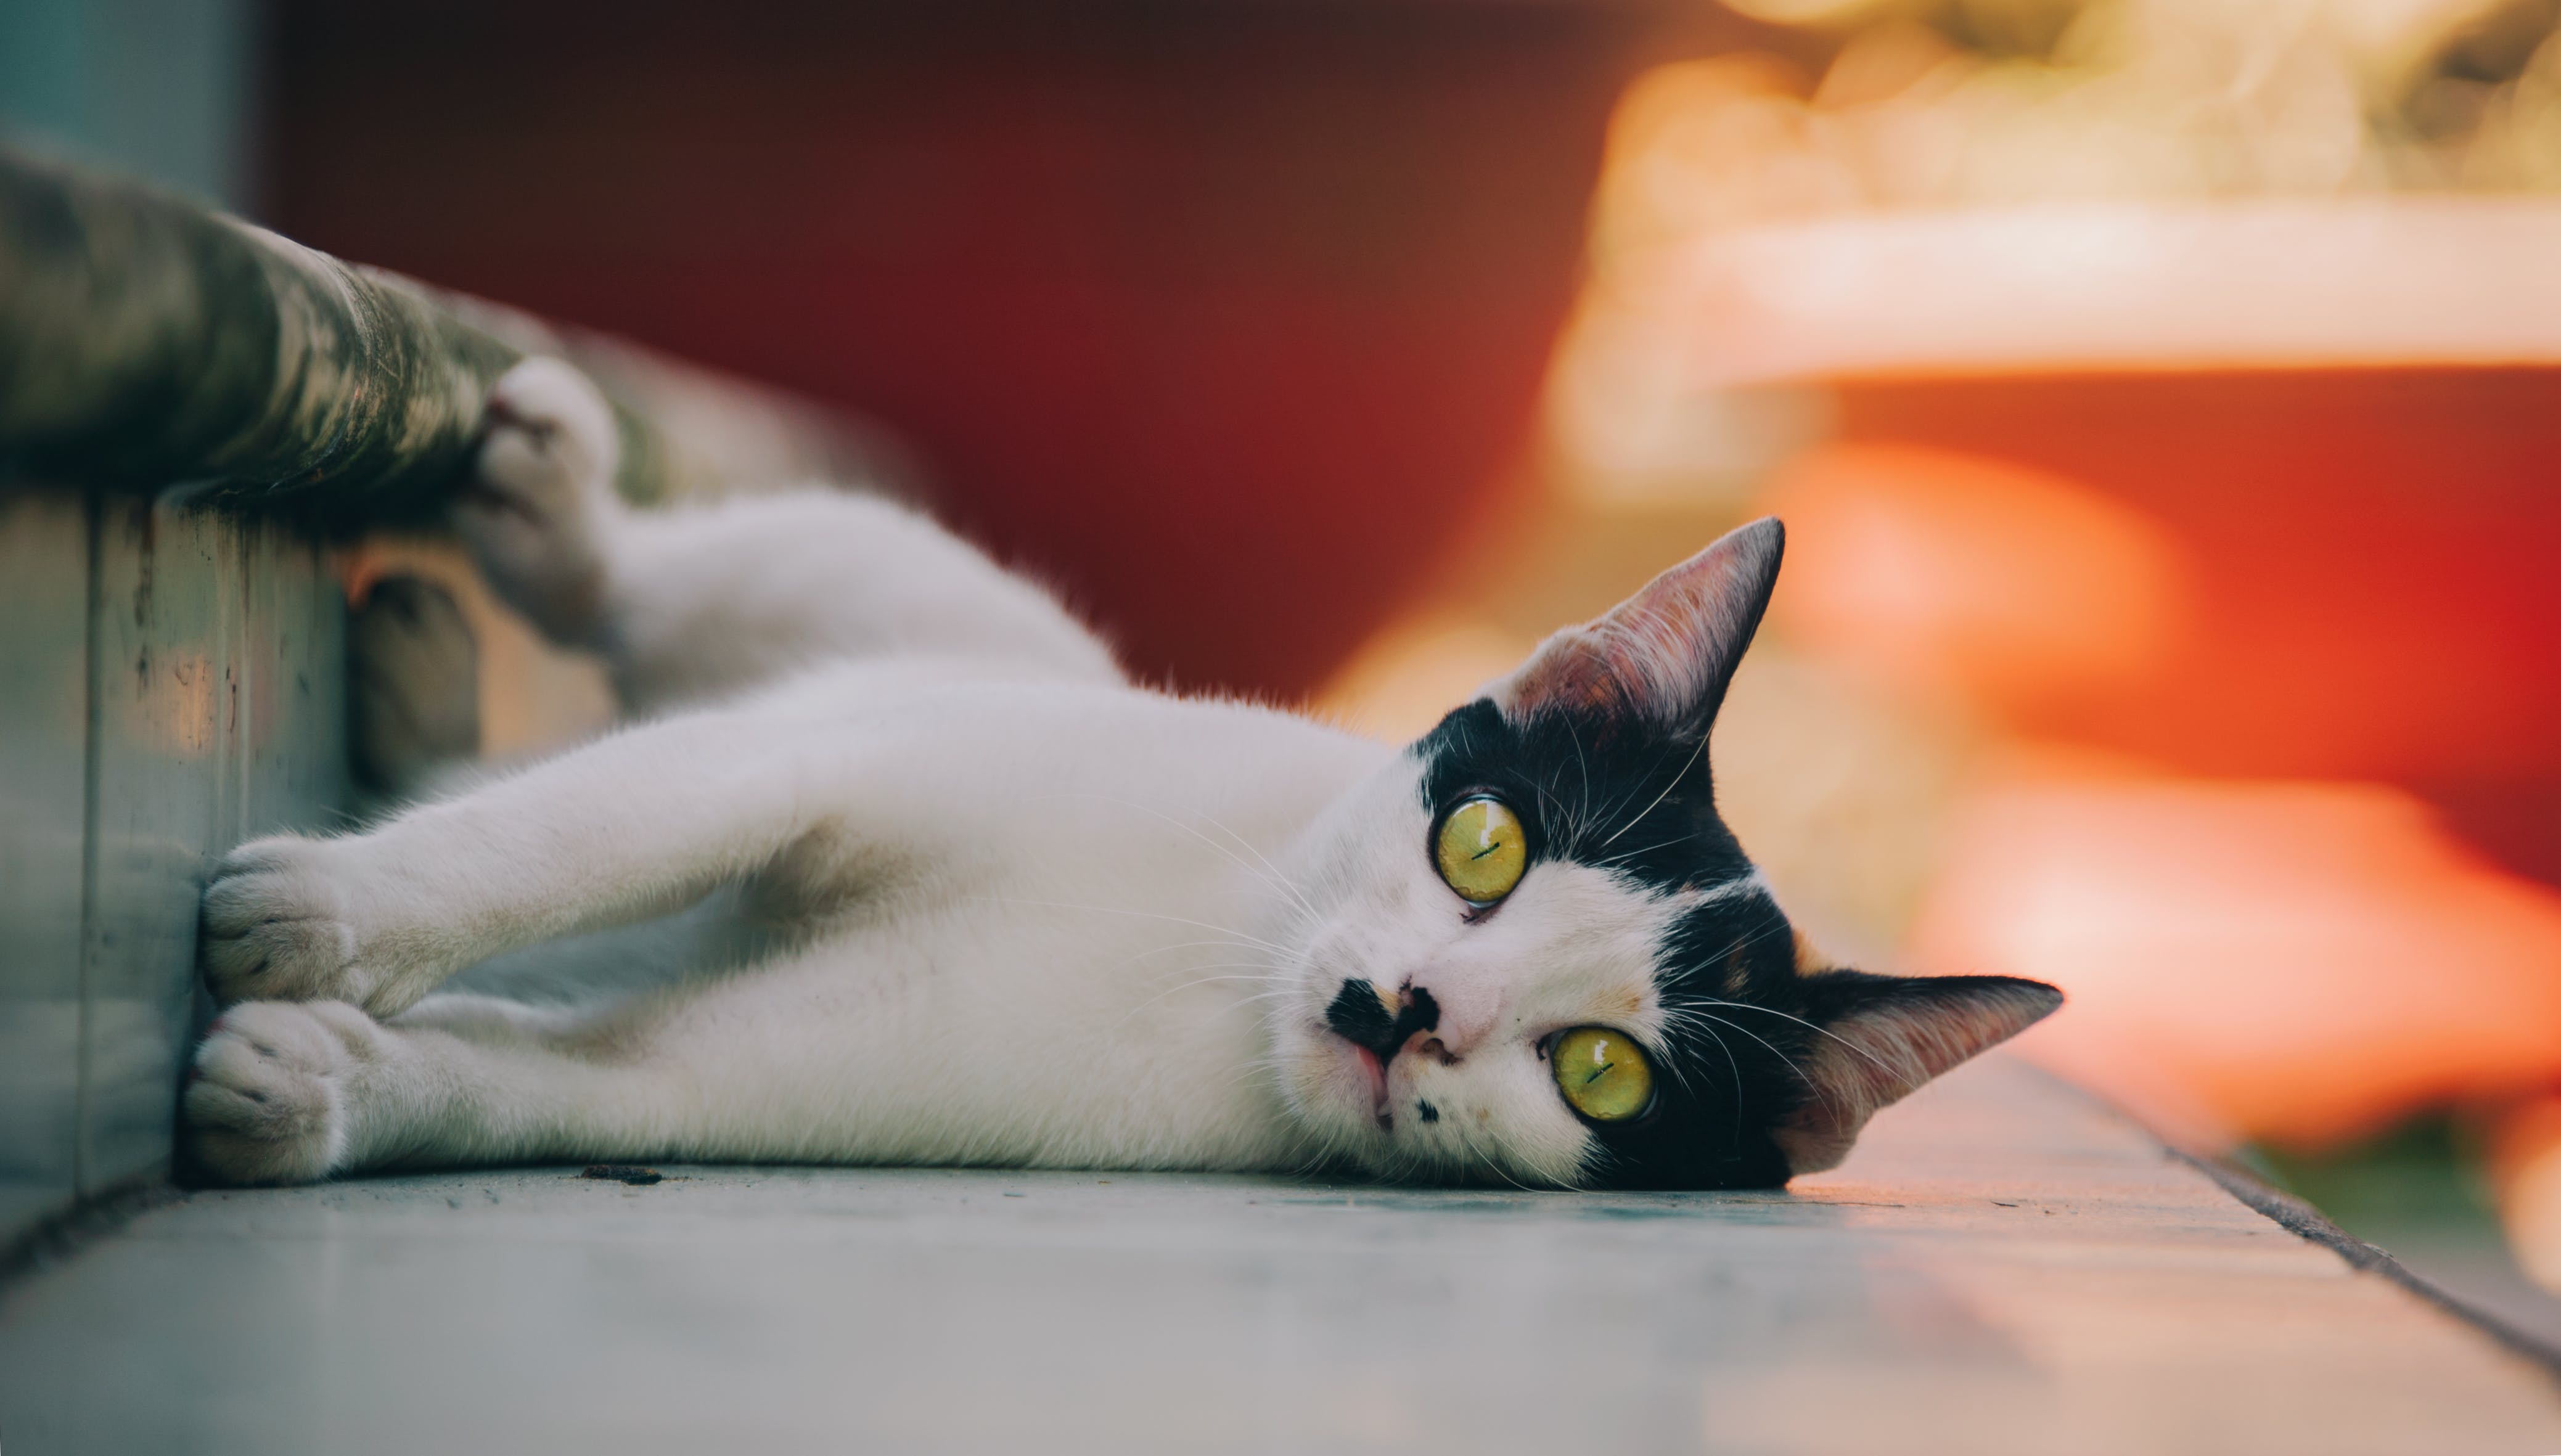 White And Black Cat Lying On Floor